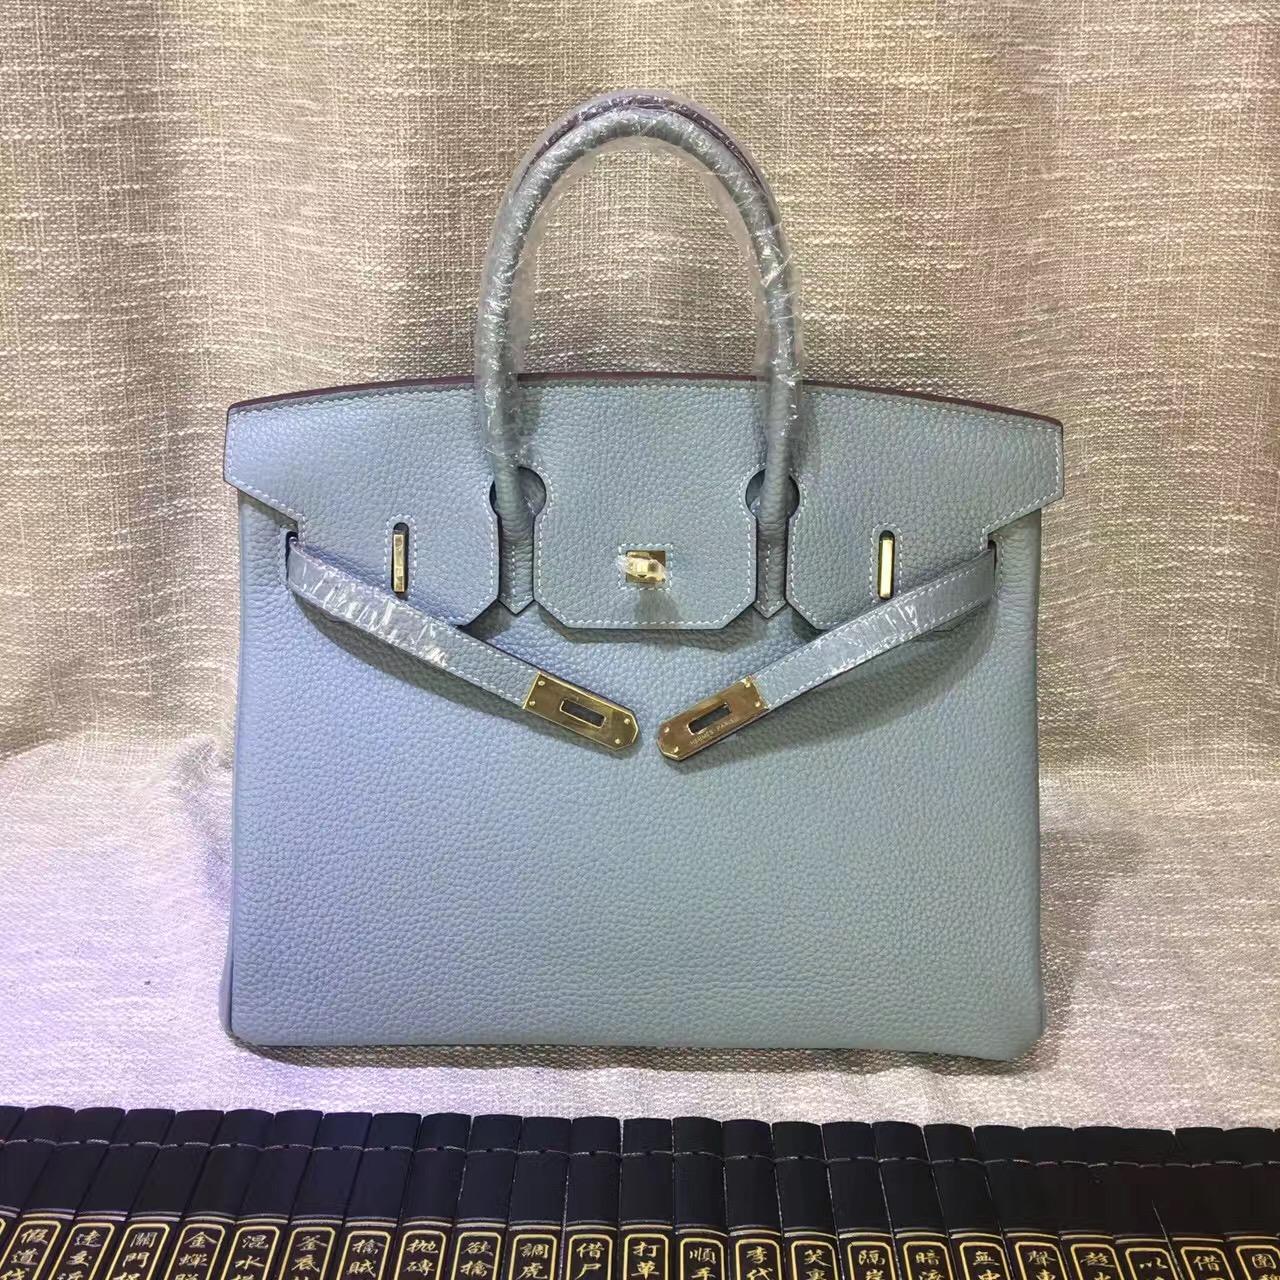 7b50159b6ea0 Hermes Birkin 30cm Togo leather Handbags grey gold  RH0302    Buy ...